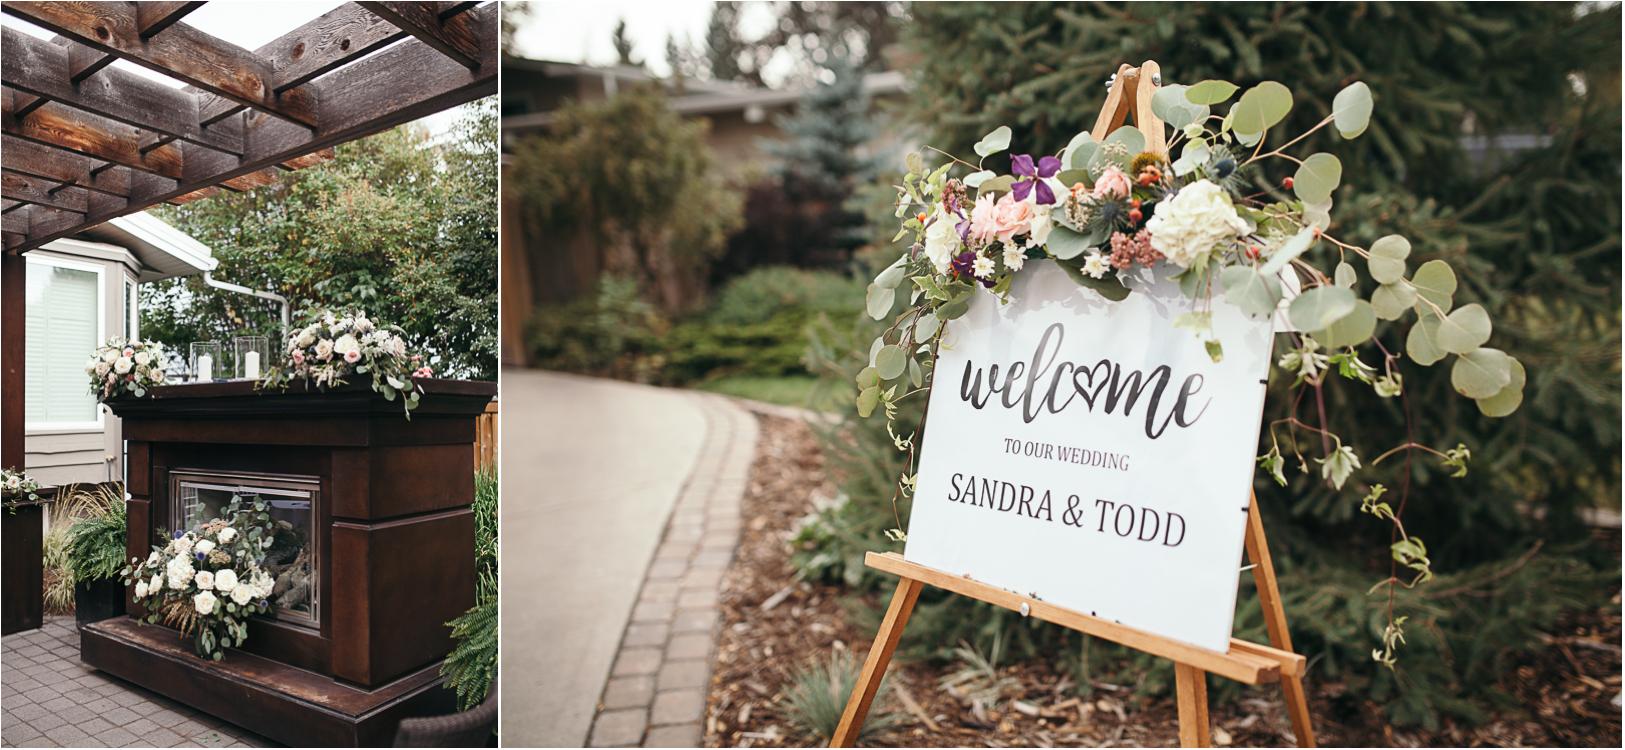 Todd+Sandra_Collage-2.jpg